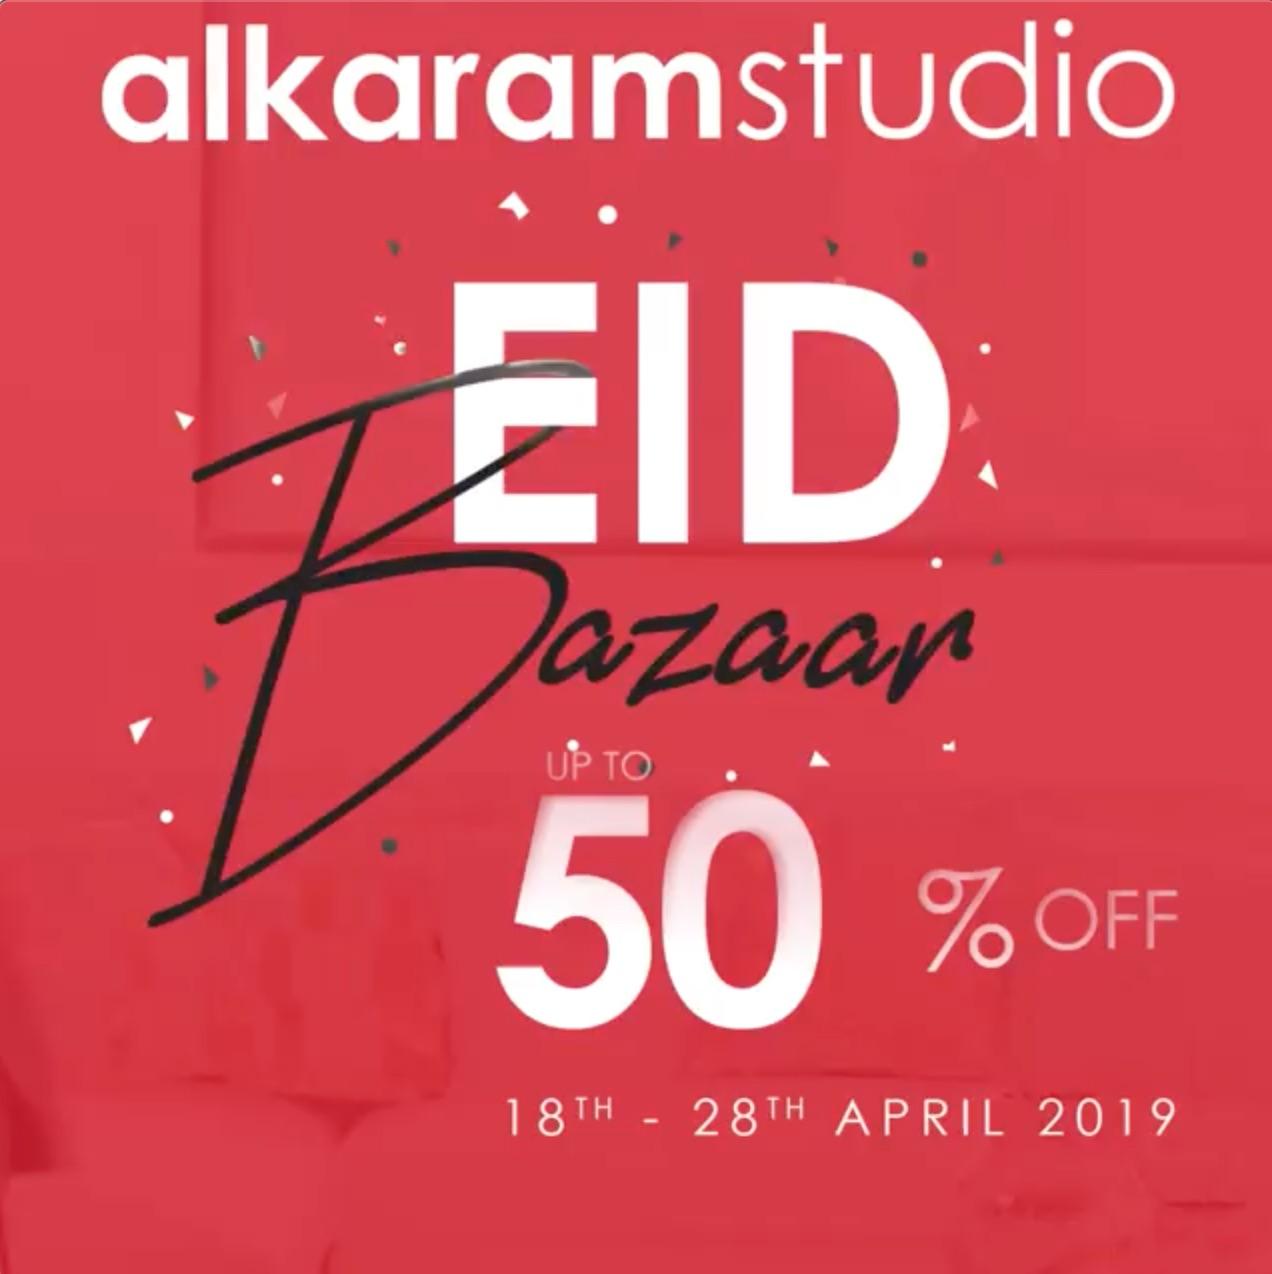 Alkaram Studio - Eid Bazaar